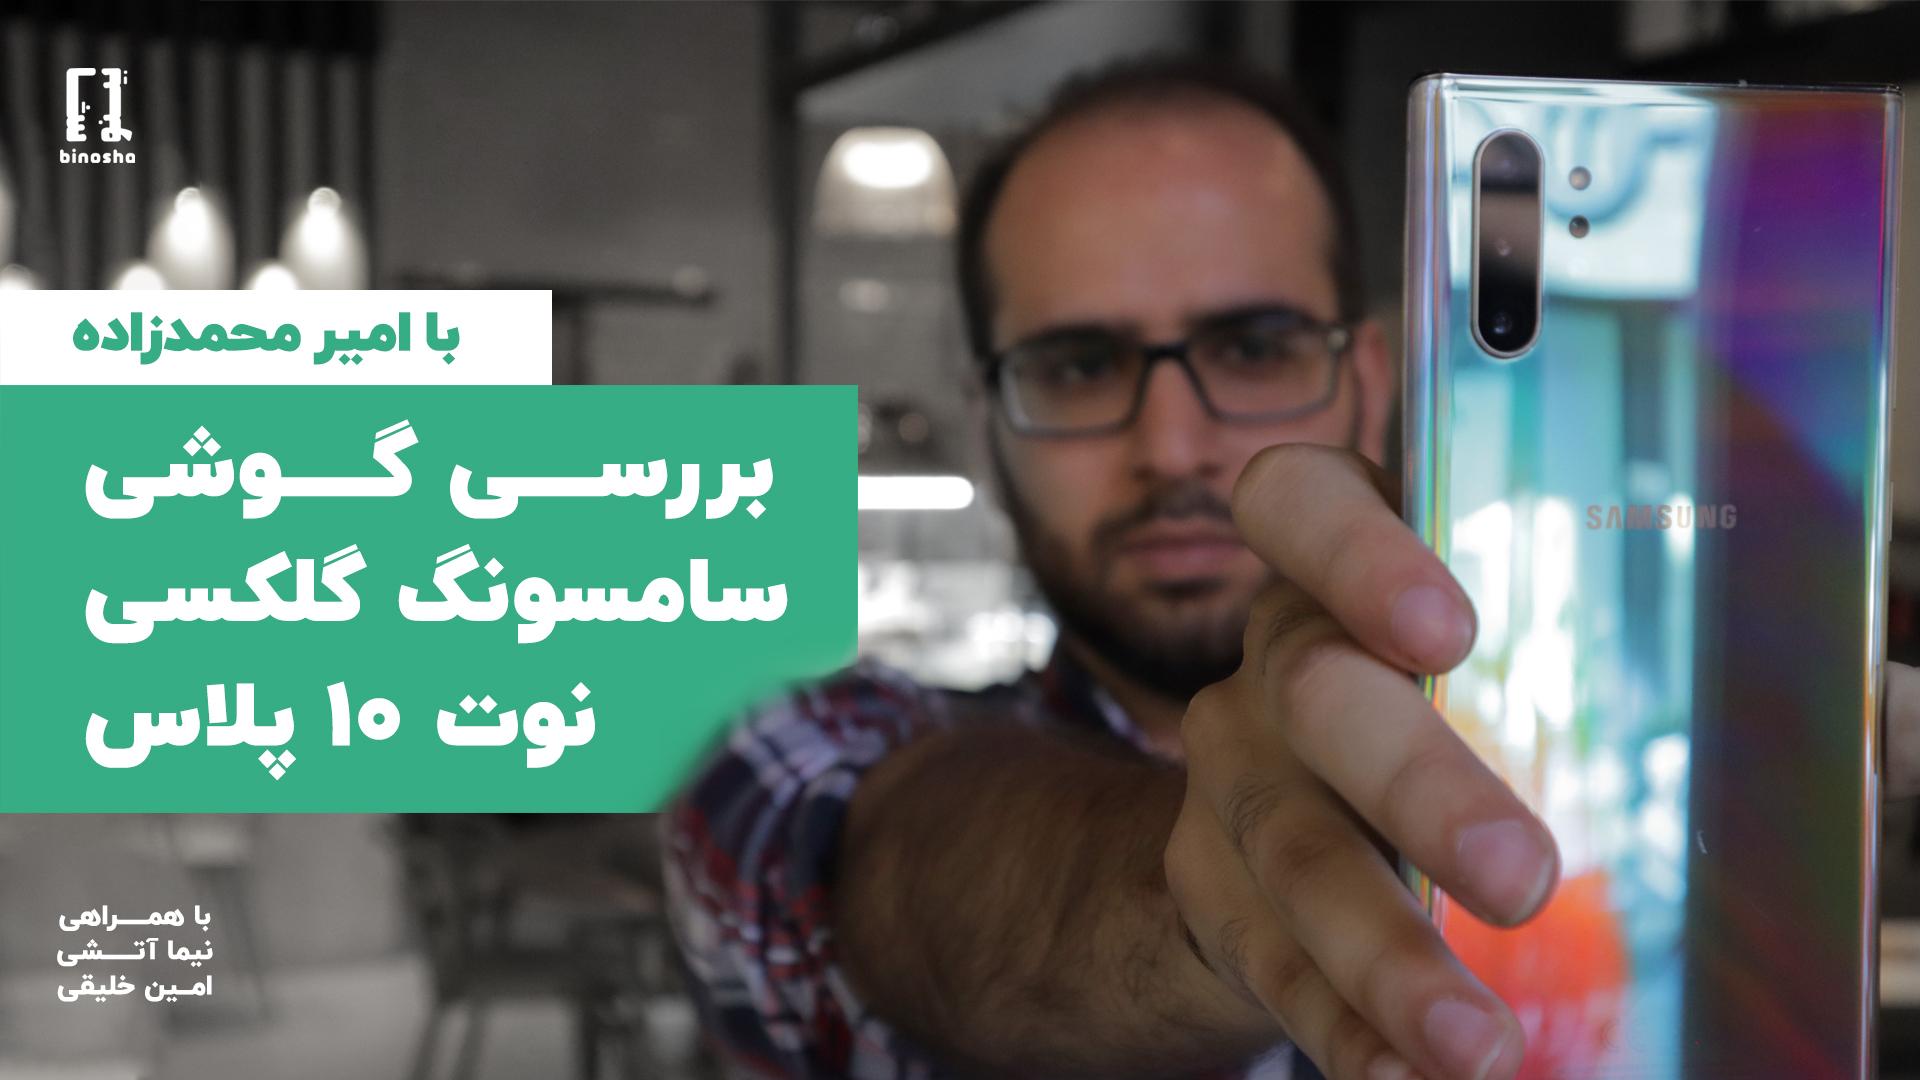 بررسی گوشی سامسونگ گلکسی نوت ۱۰ پلاس| Samsung Galaxy Note 10+ Review